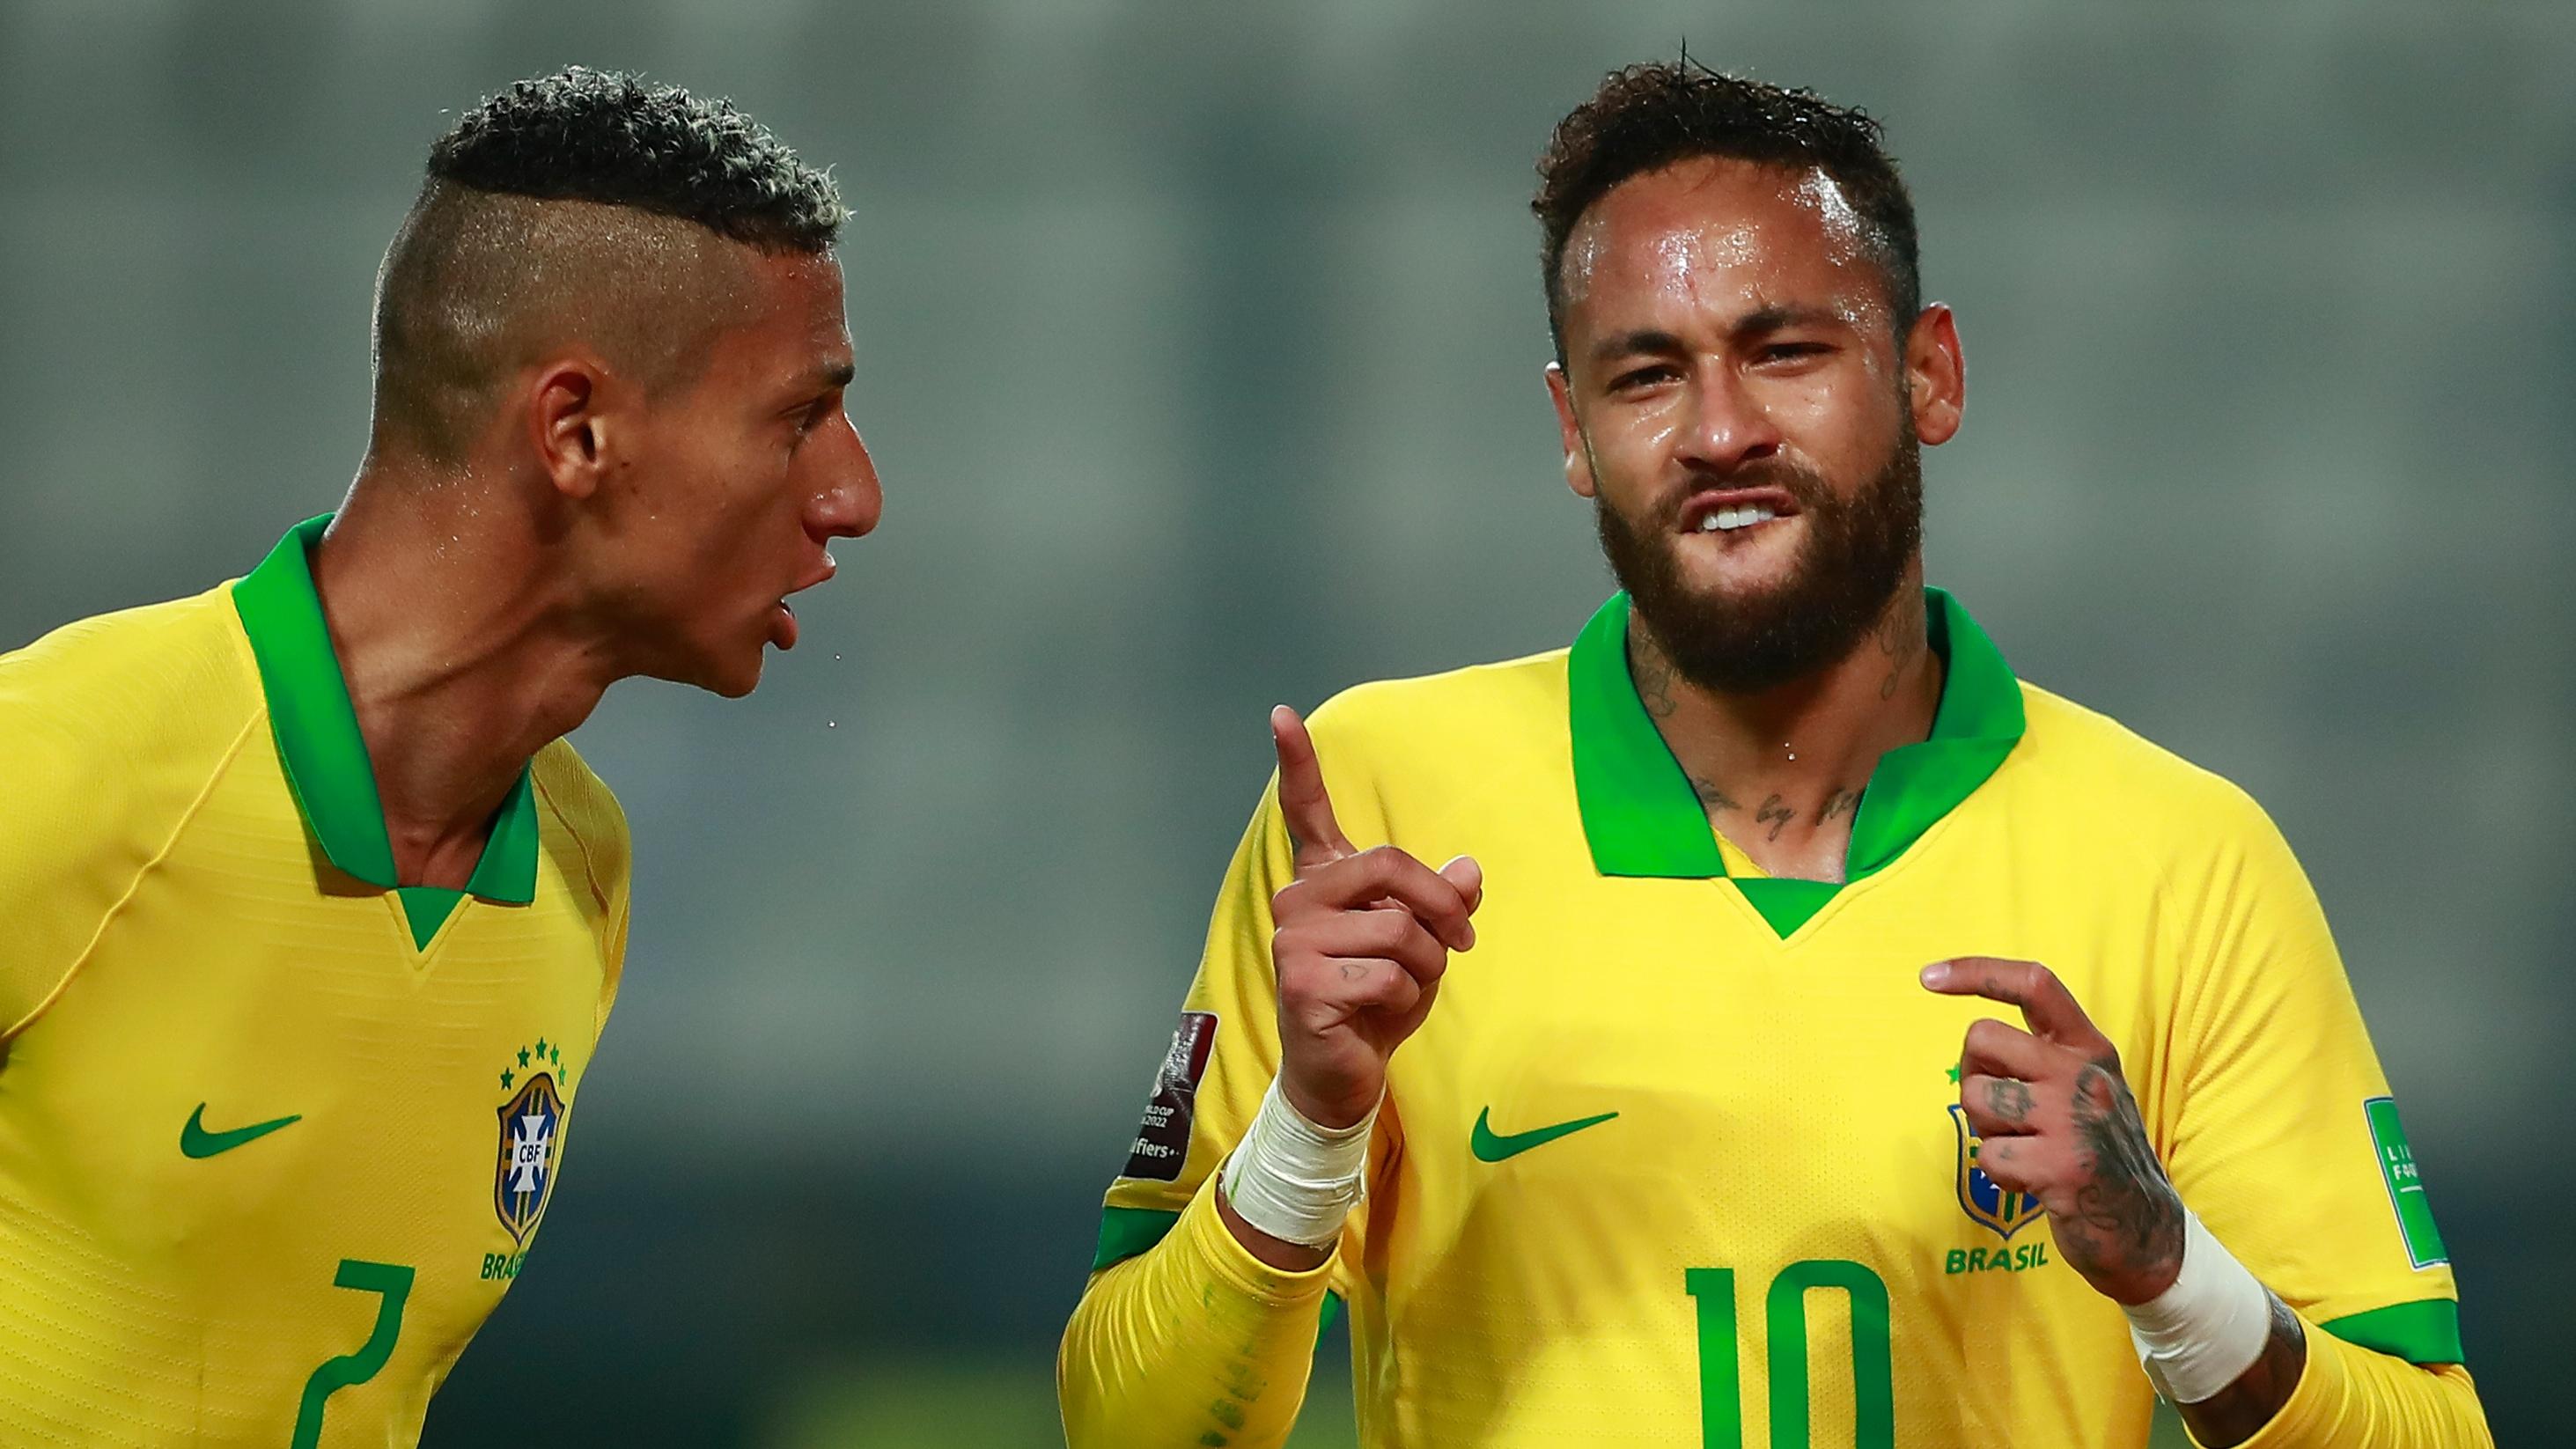 Neymar surpasses Ronaldo as Brazil's second-highest goalscorer | Goal.com